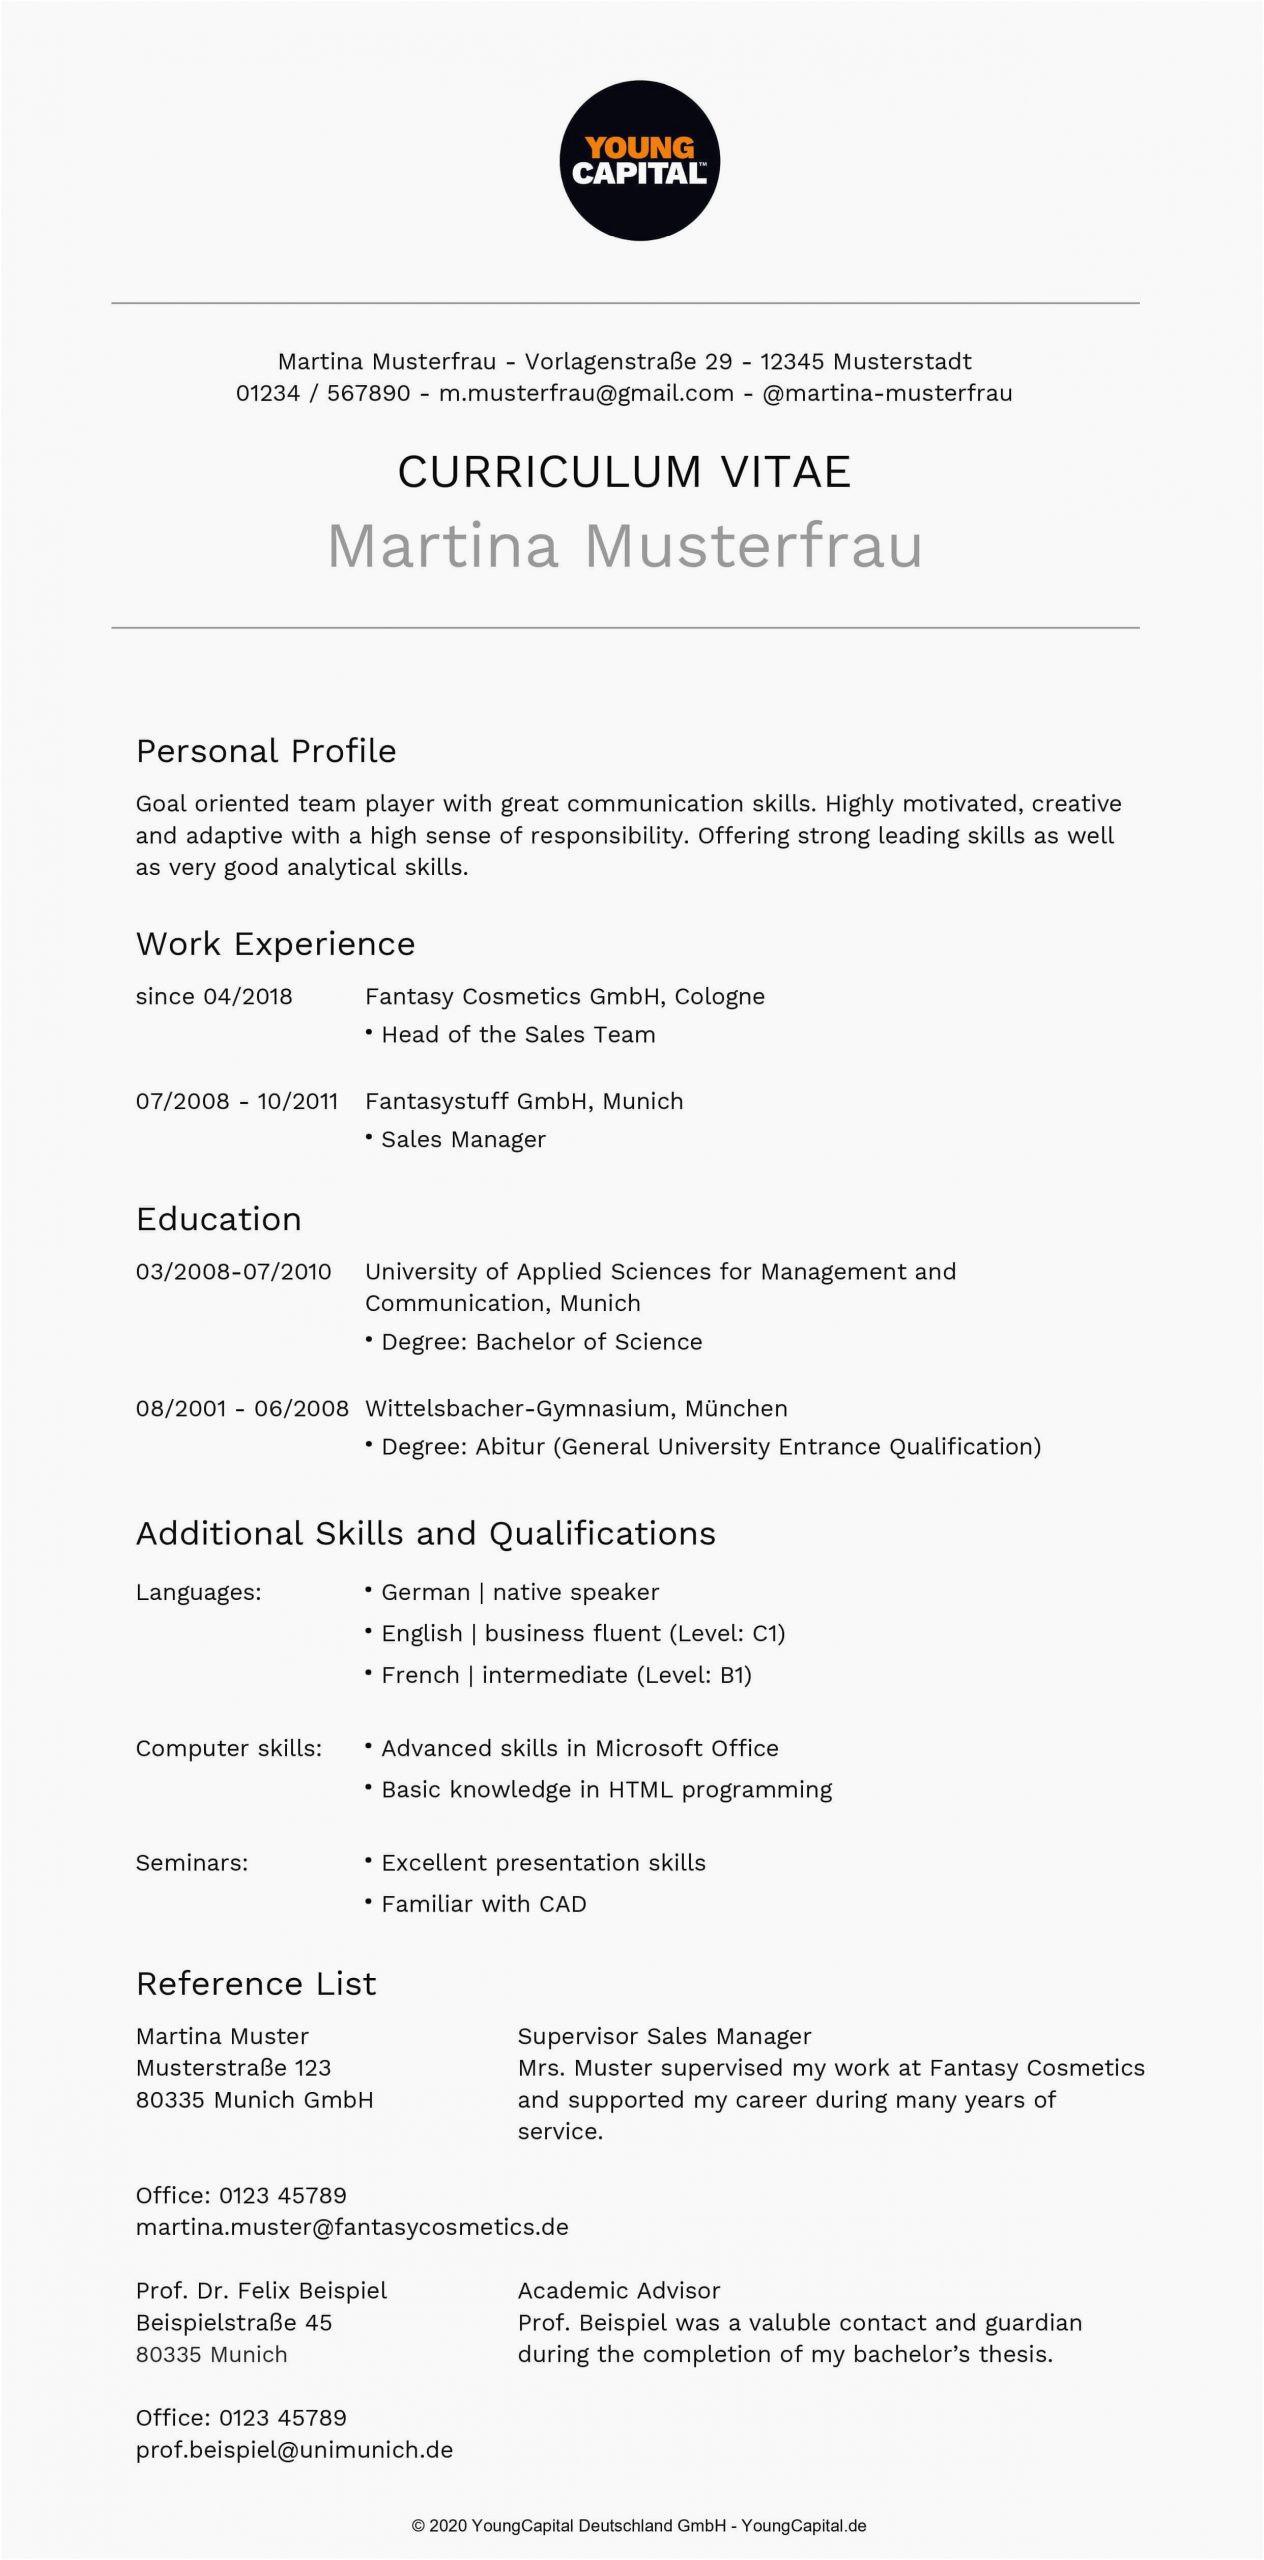 Level C1 Englisch Im Lebenslauf Curriculum Vitae Lebenslauf Englisch Bewerbung Auf Englisch